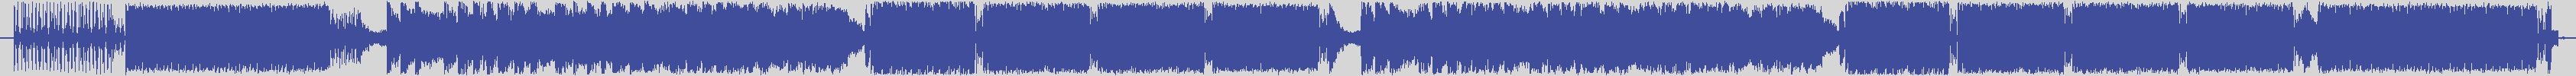 hitaly_muzik [smile1057] Hitaly Crew - Olè [Original Mix] audio wave form